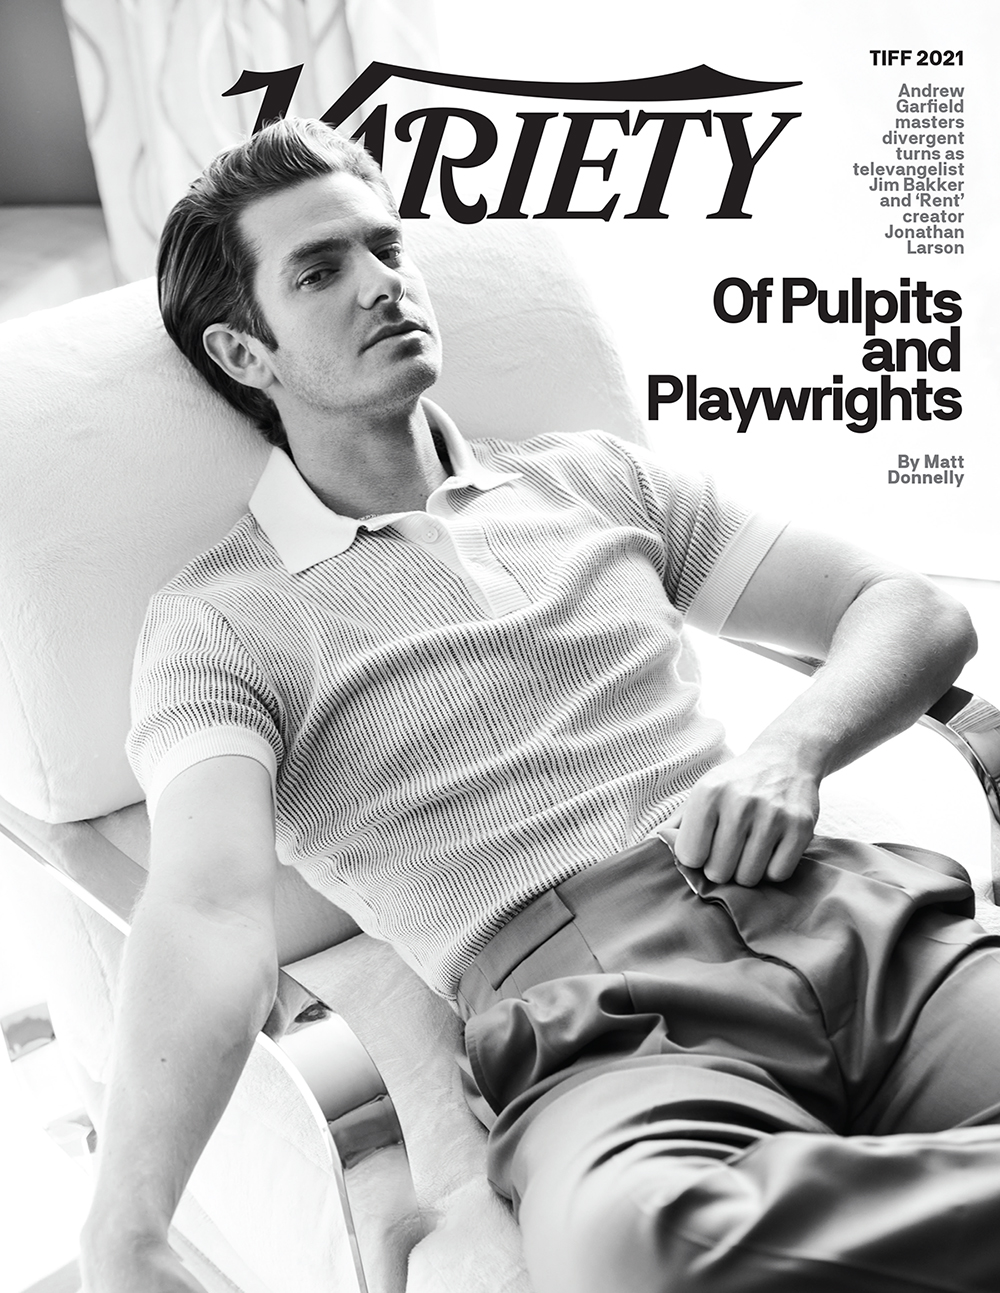 Andrew Garfield Variety Cover